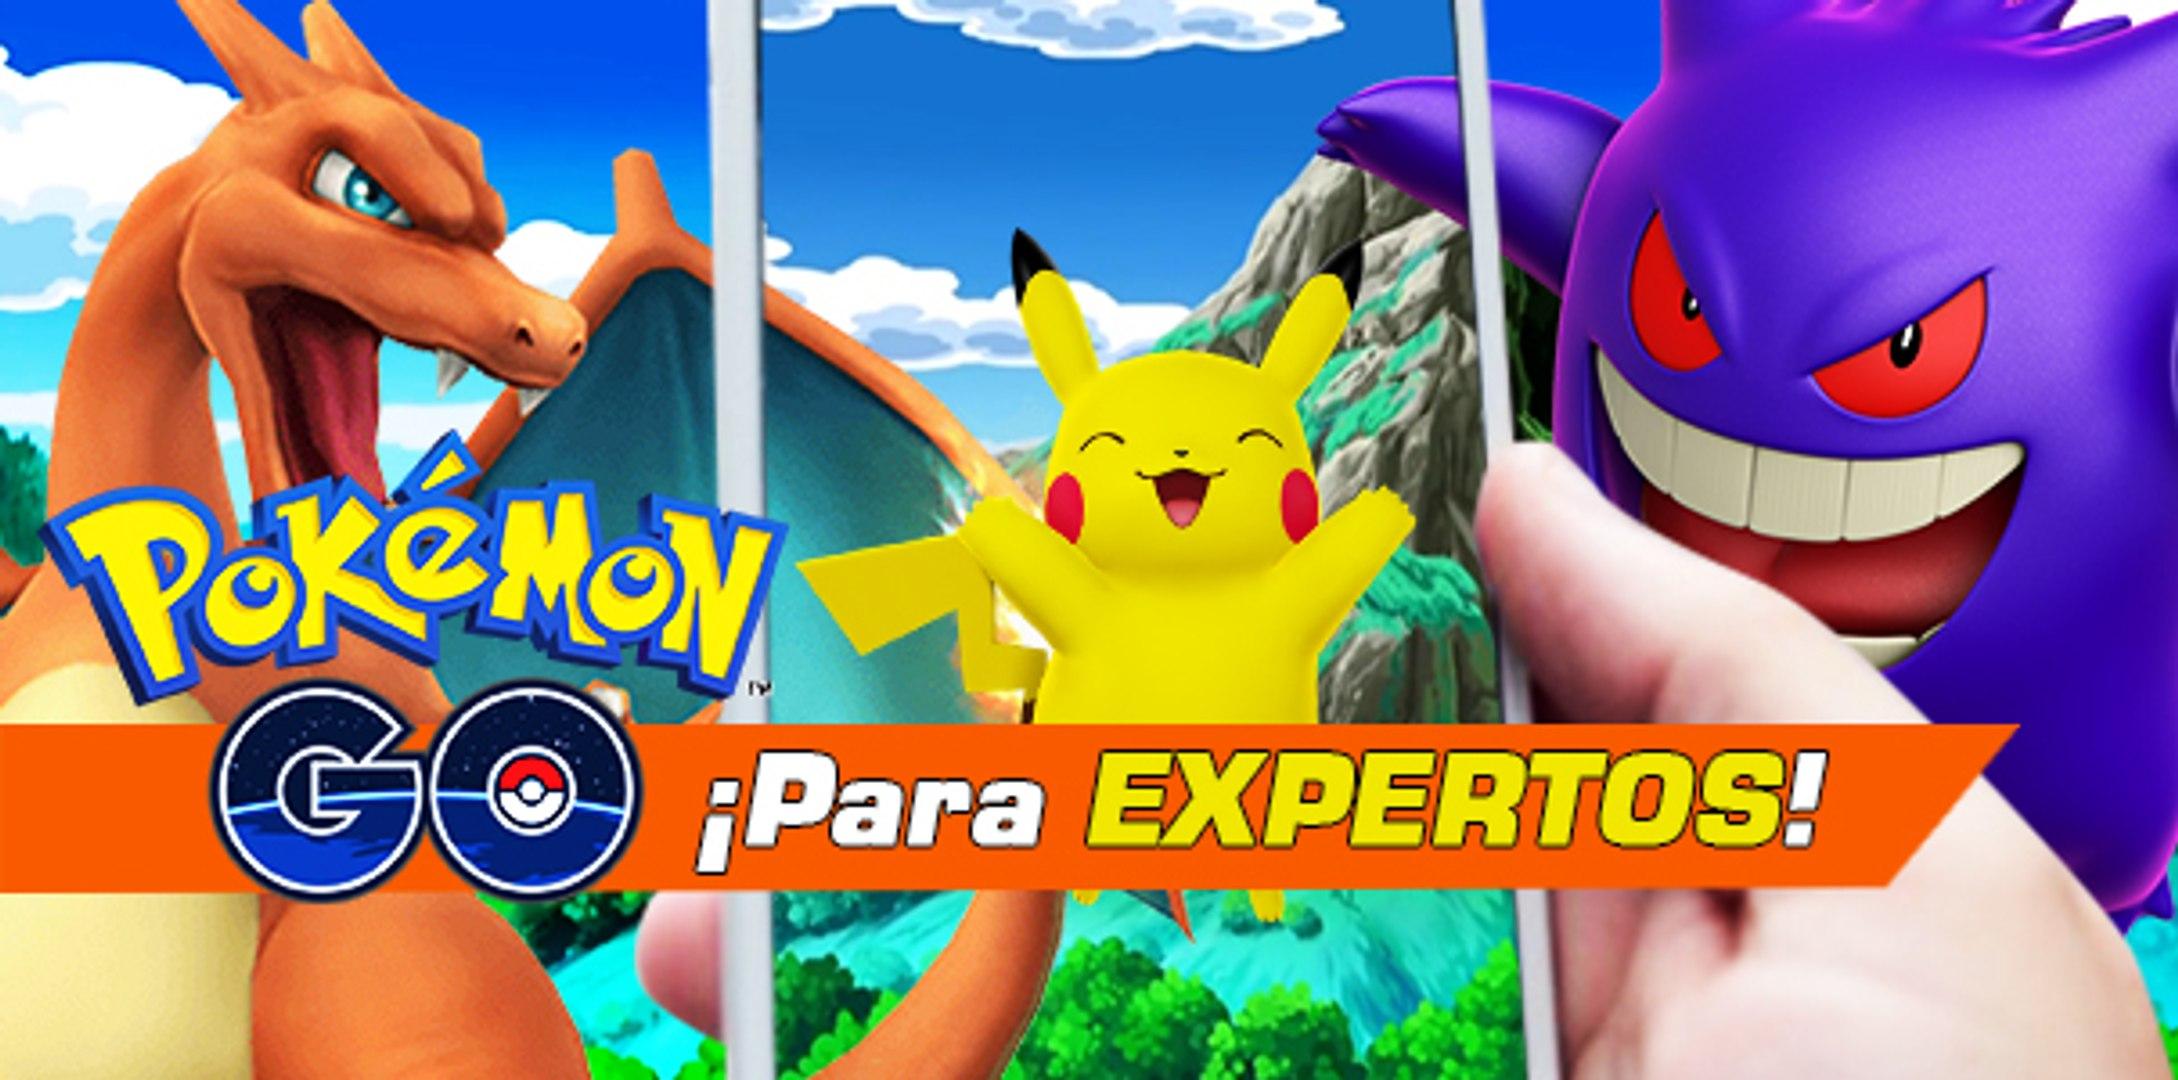 ¿Es bueno mi Pokémon? | Pokémon GO para EXPERTOS